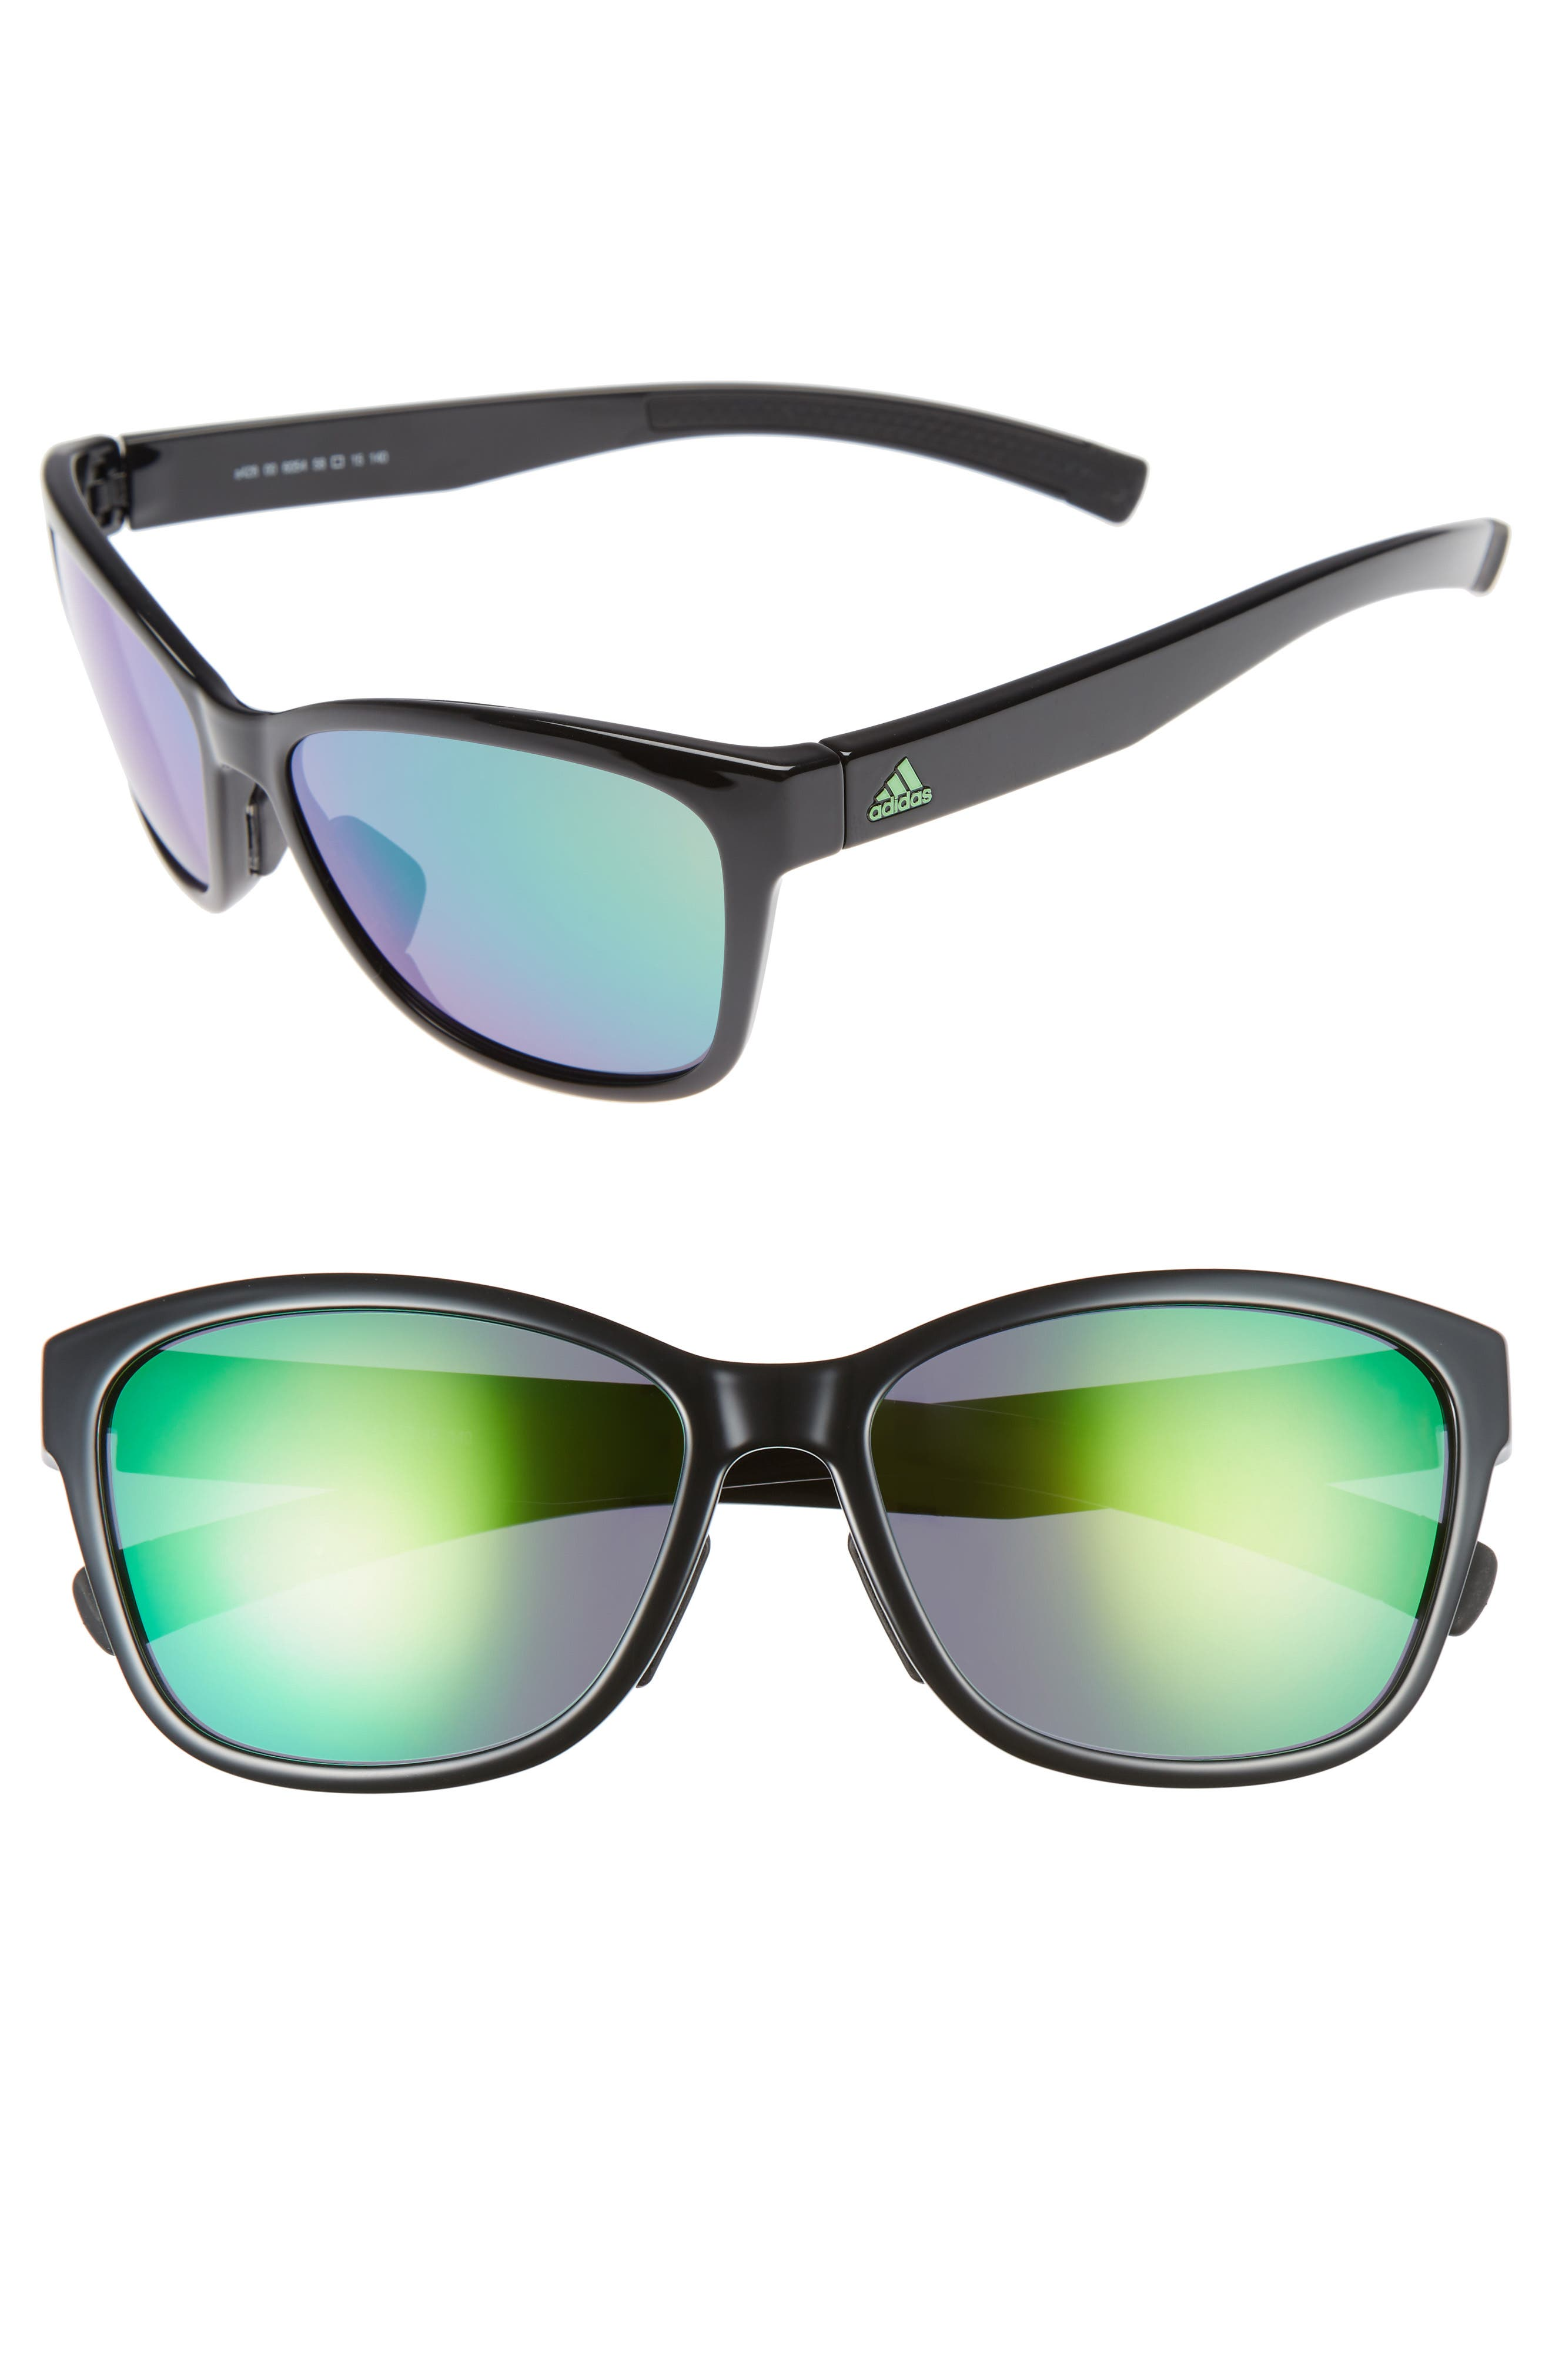 ADIDAS,                             Excalate 58mm Mirrored Sunglasses,                             Main thumbnail 1, color,                             SHINY BLACK/ GREEN MIRROR